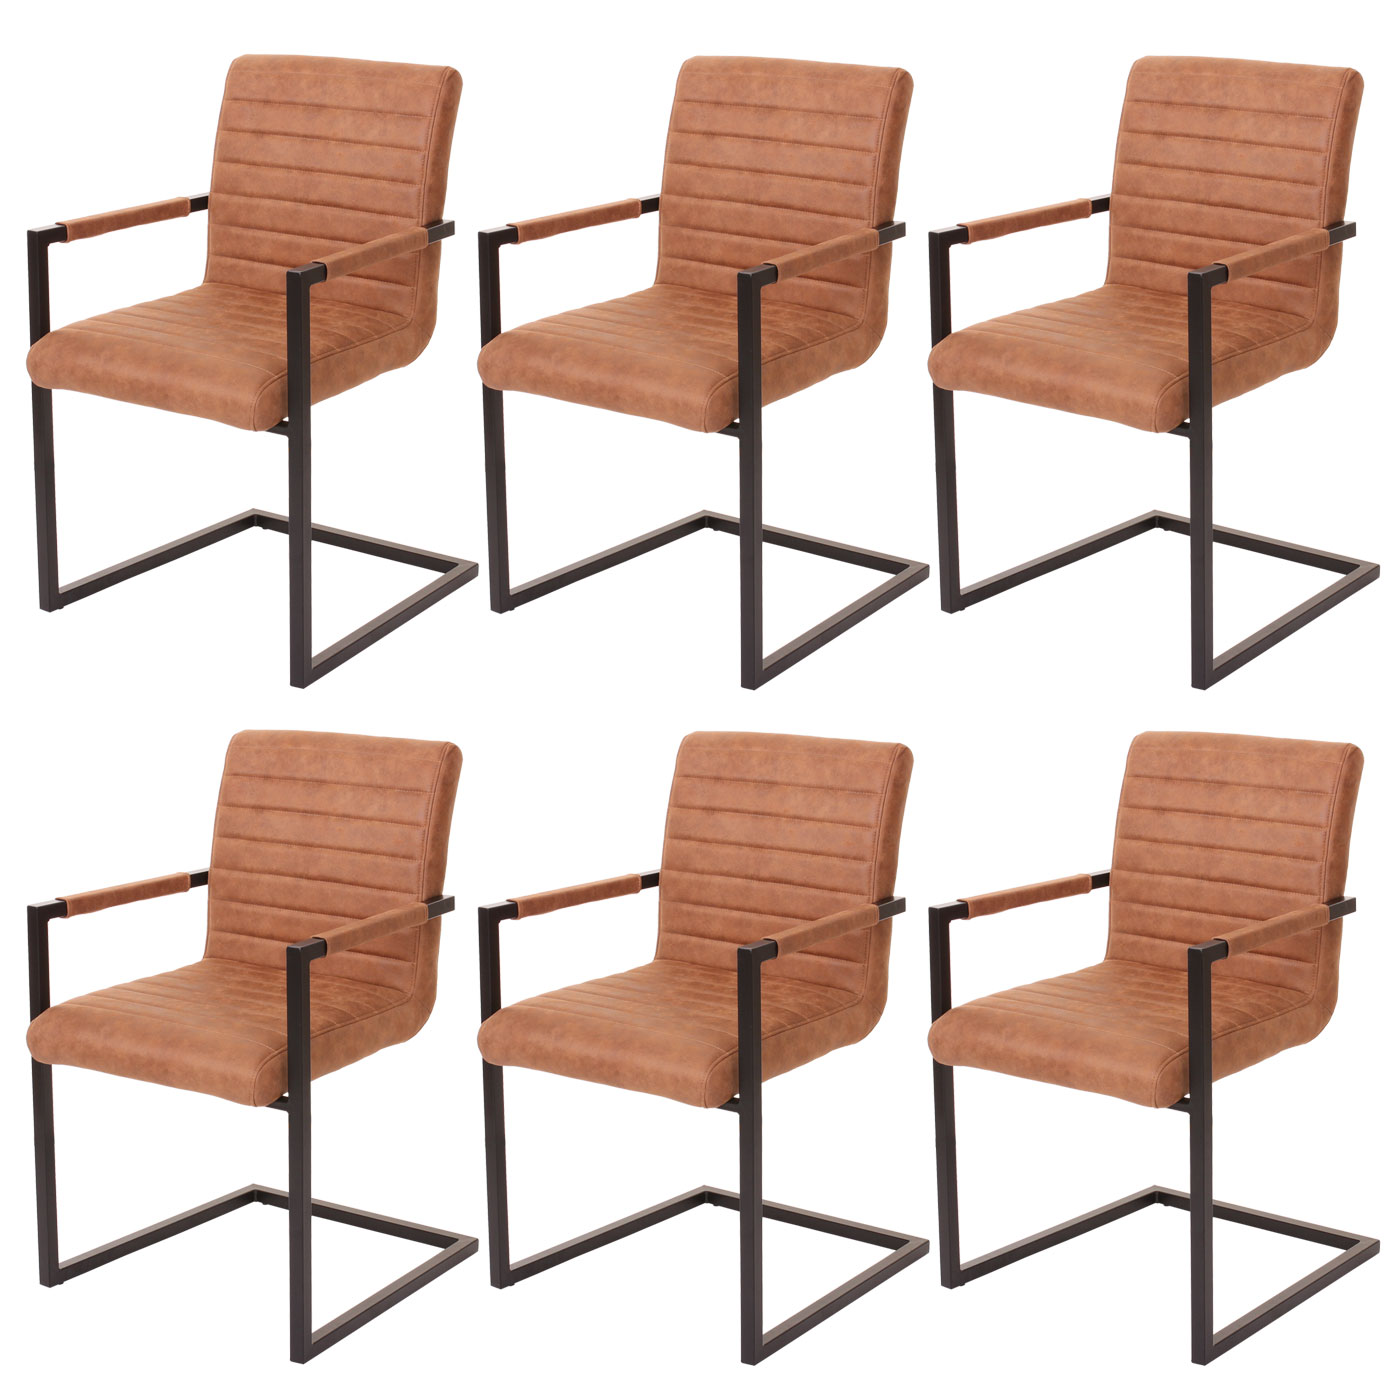 2x chaise salle manger hwc b45 cantilever imitation daim tissu marron ebay. Black Bedroom Furniture Sets. Home Design Ideas